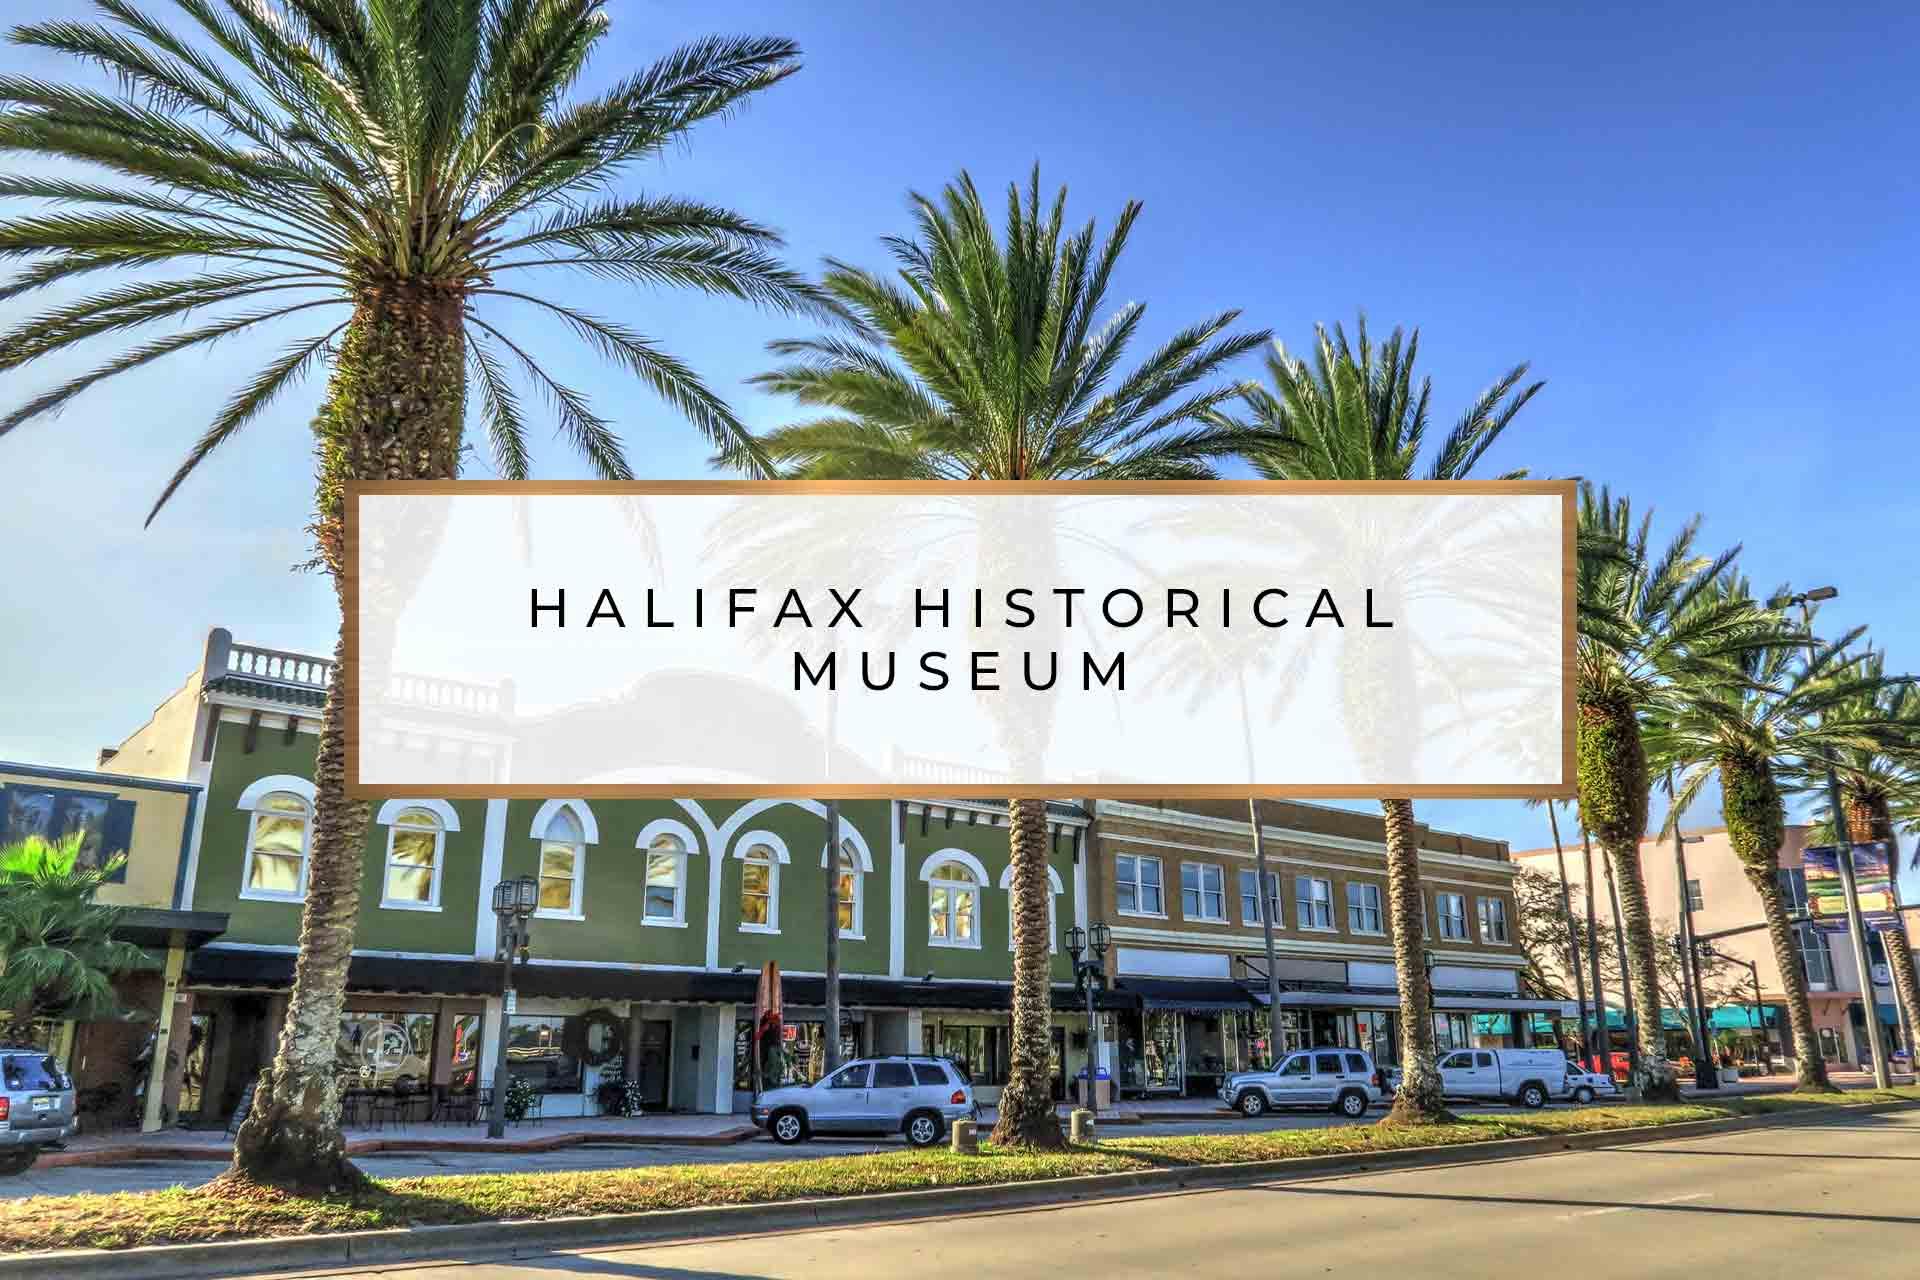 Halifax Historical Museum